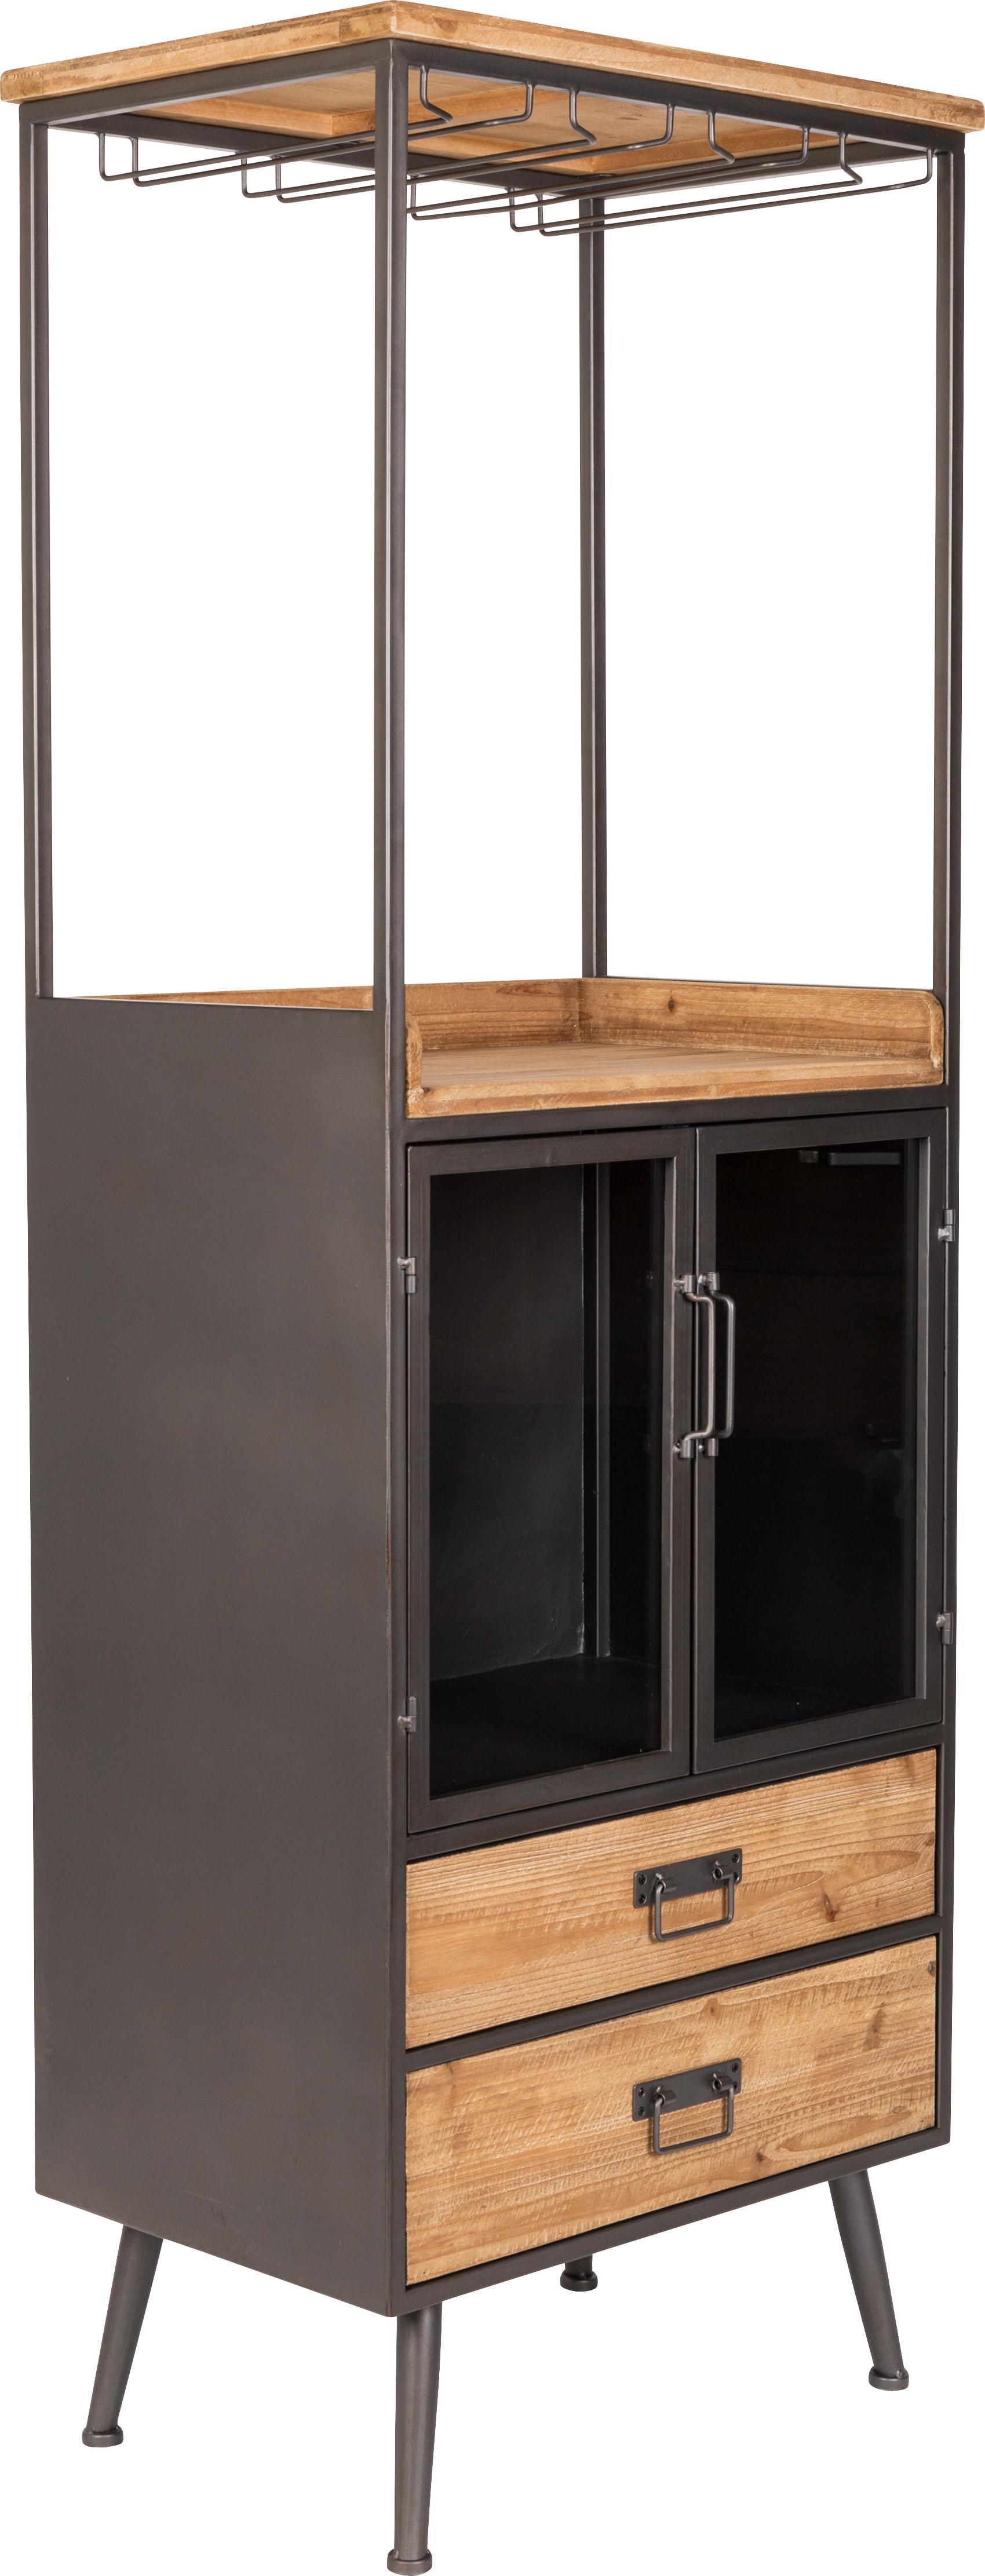 Vitrina de madera y metal Damian, Madera de abeto, gris, An 60 x Al 171 cm